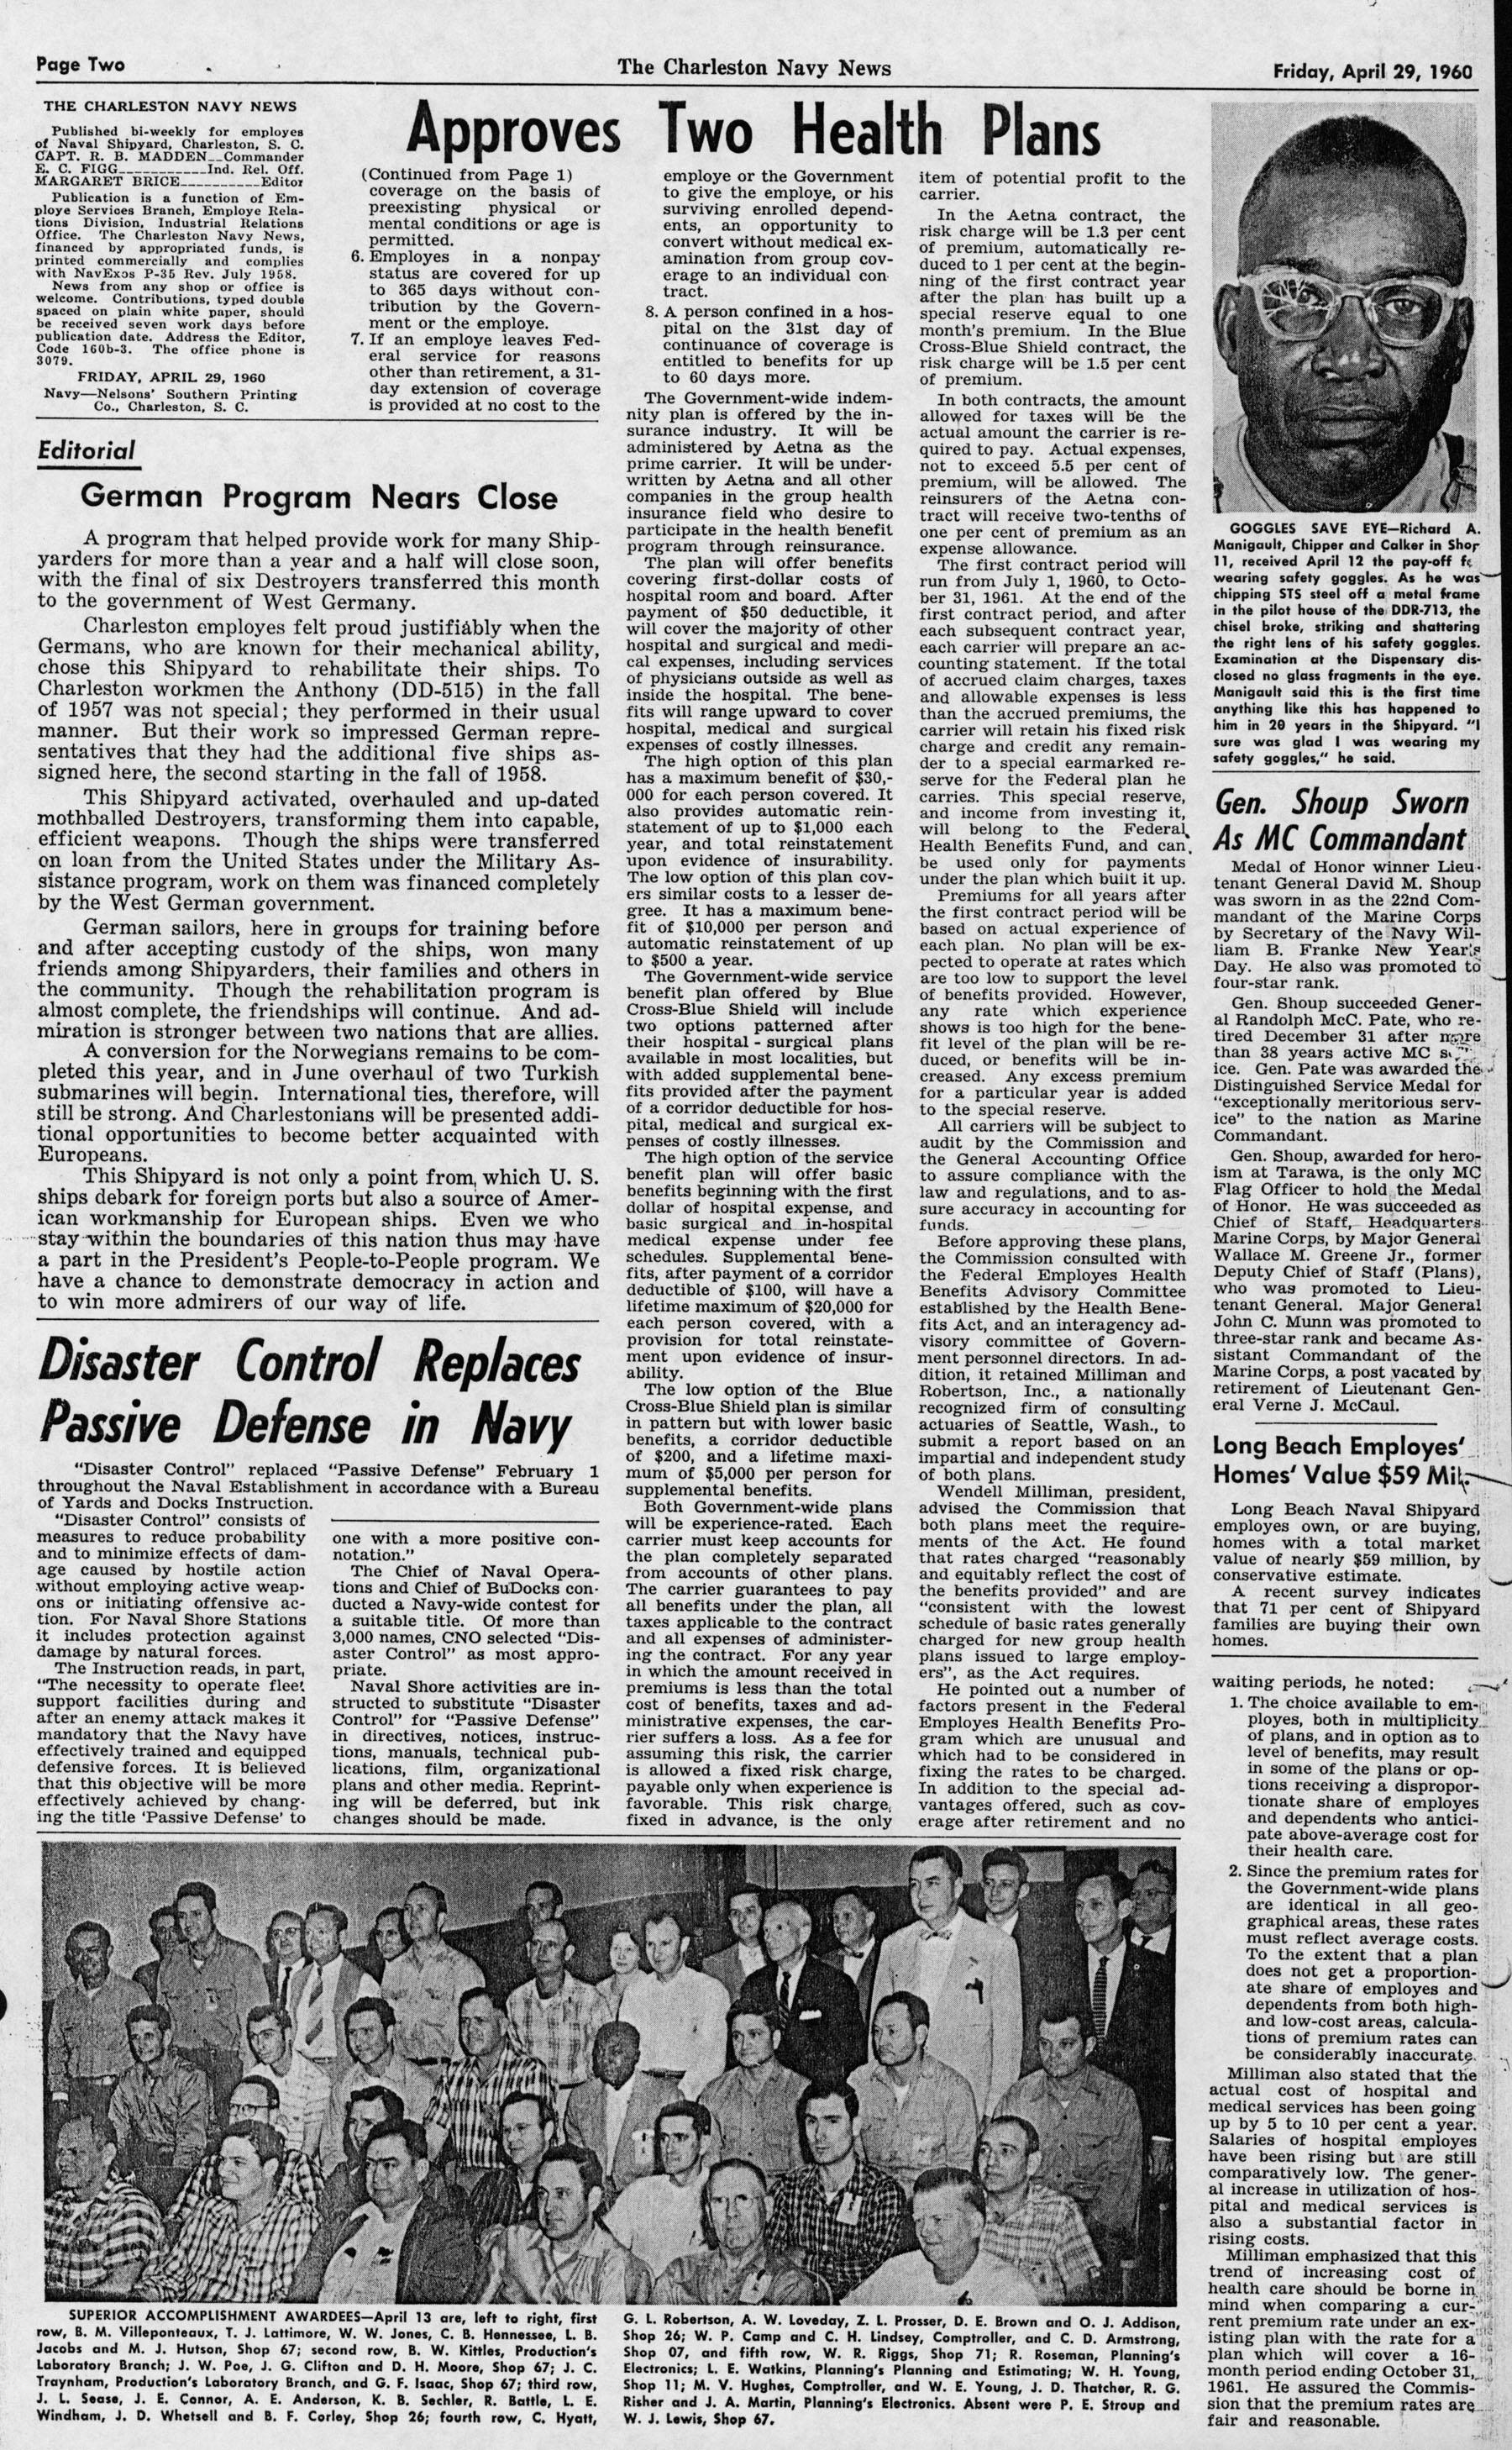 The Charleston Navy News, Volume 18, Edition 21, page ii